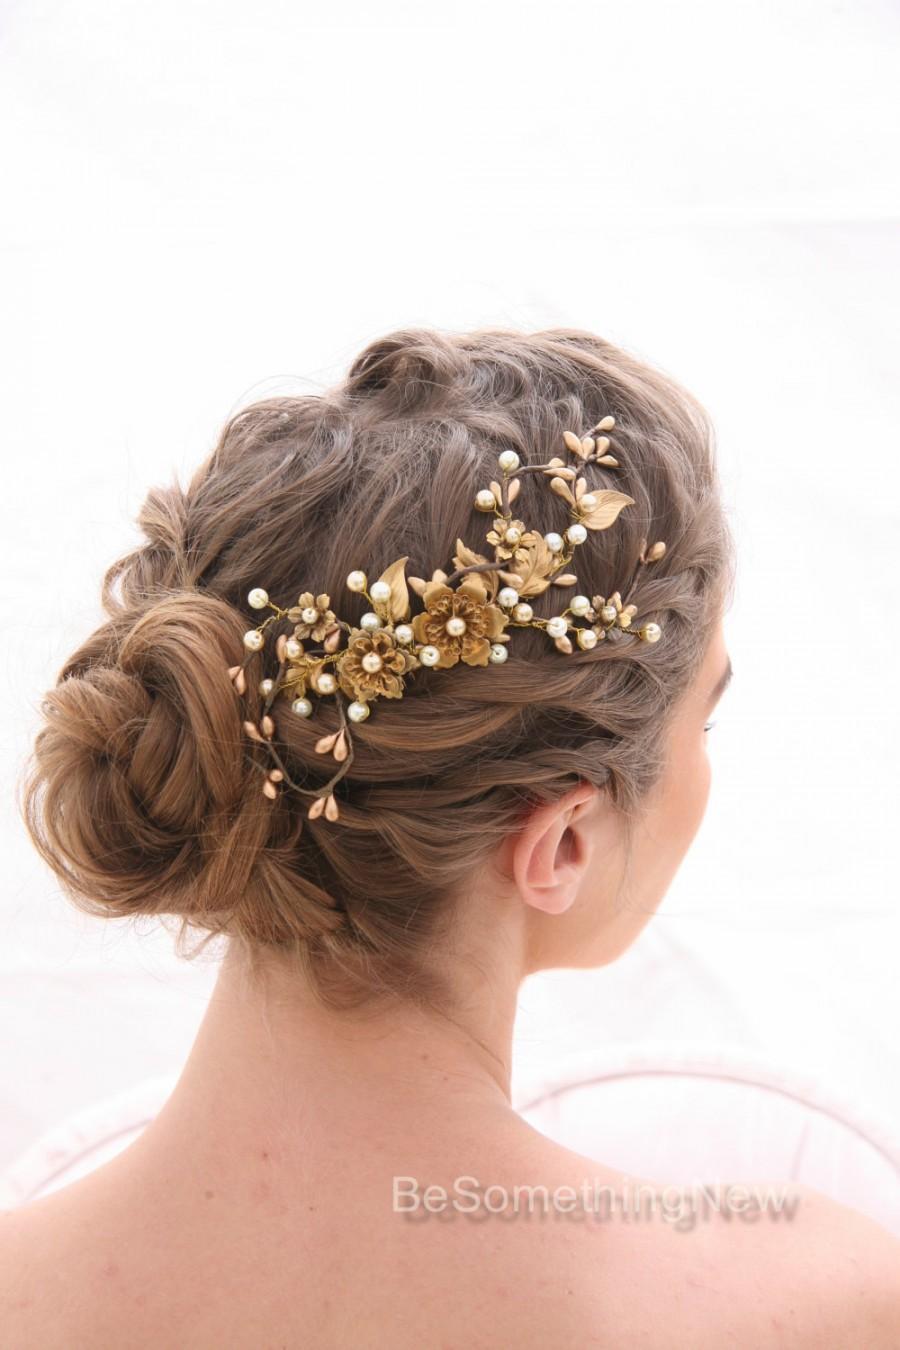 Mariage - Bridal Decorative Comb Rustic Gold and Bronze Wedding Hair Comb, Golden Wedding Headpiece Brassy Boho Wedding Hair Comb Gold Metal Comb